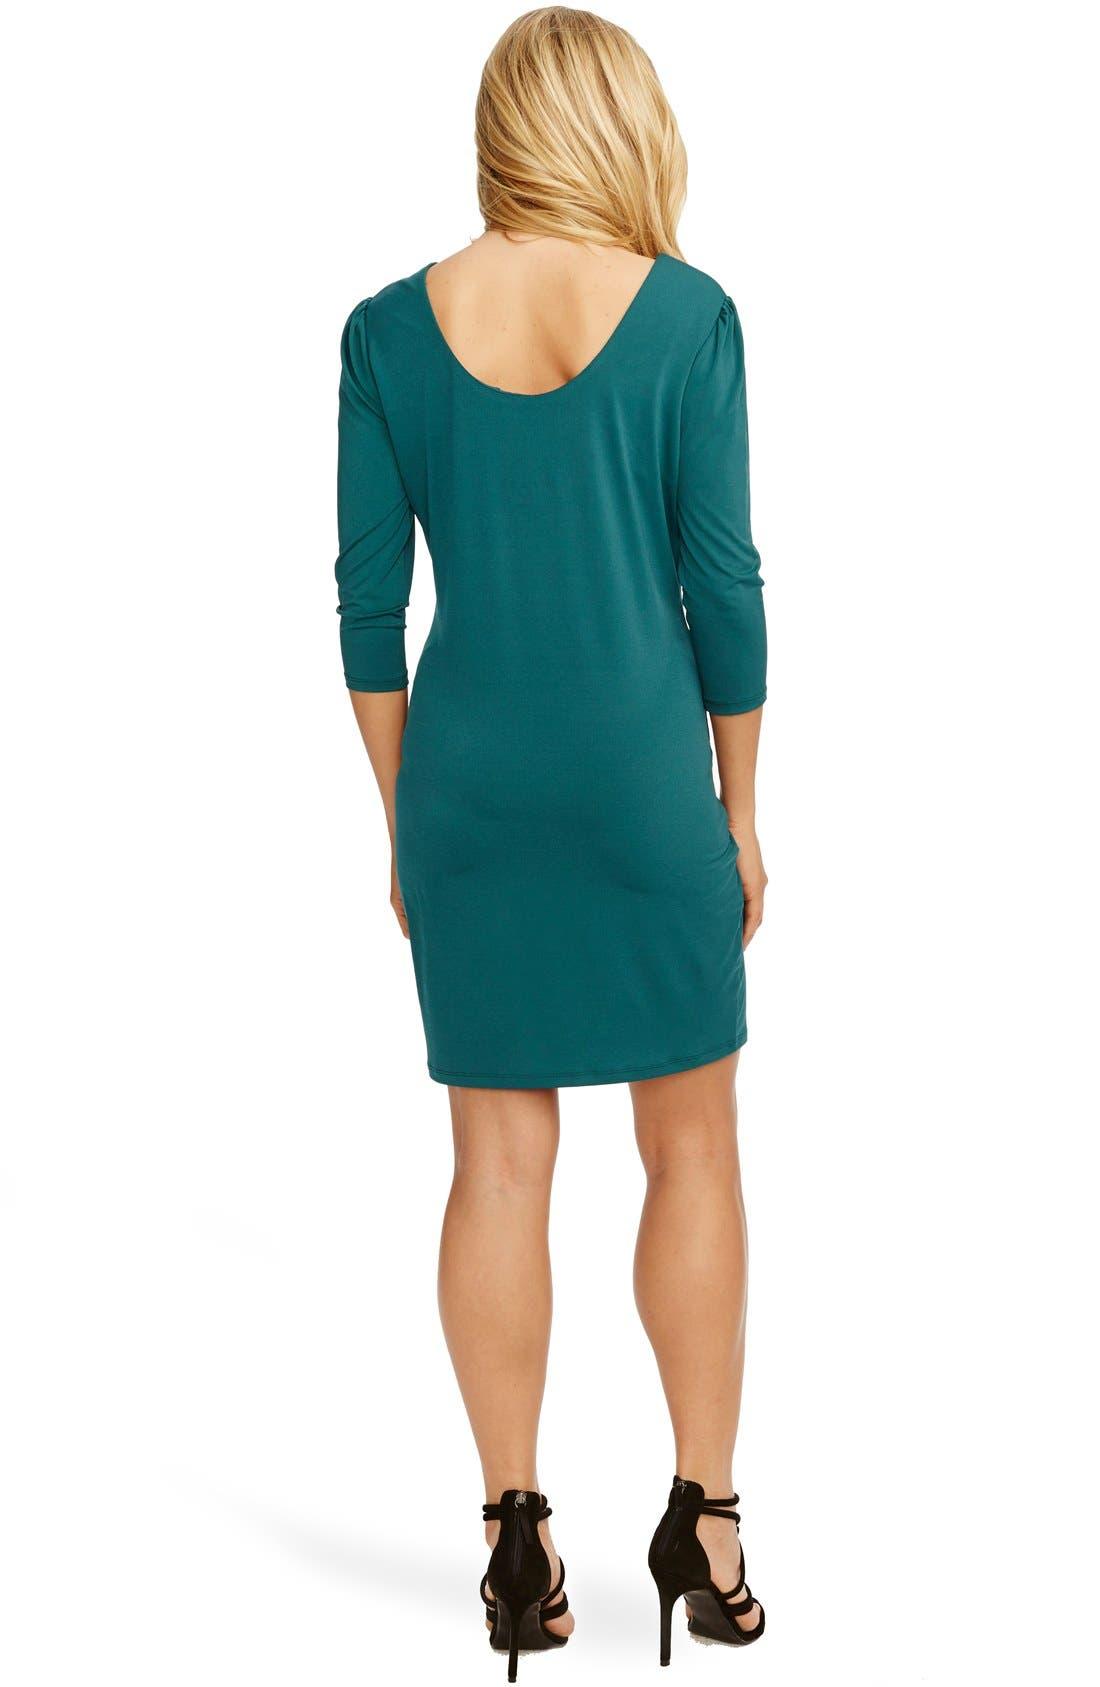 'Audra' Maternity Dress,                             Alternate thumbnail 2, color,                             401